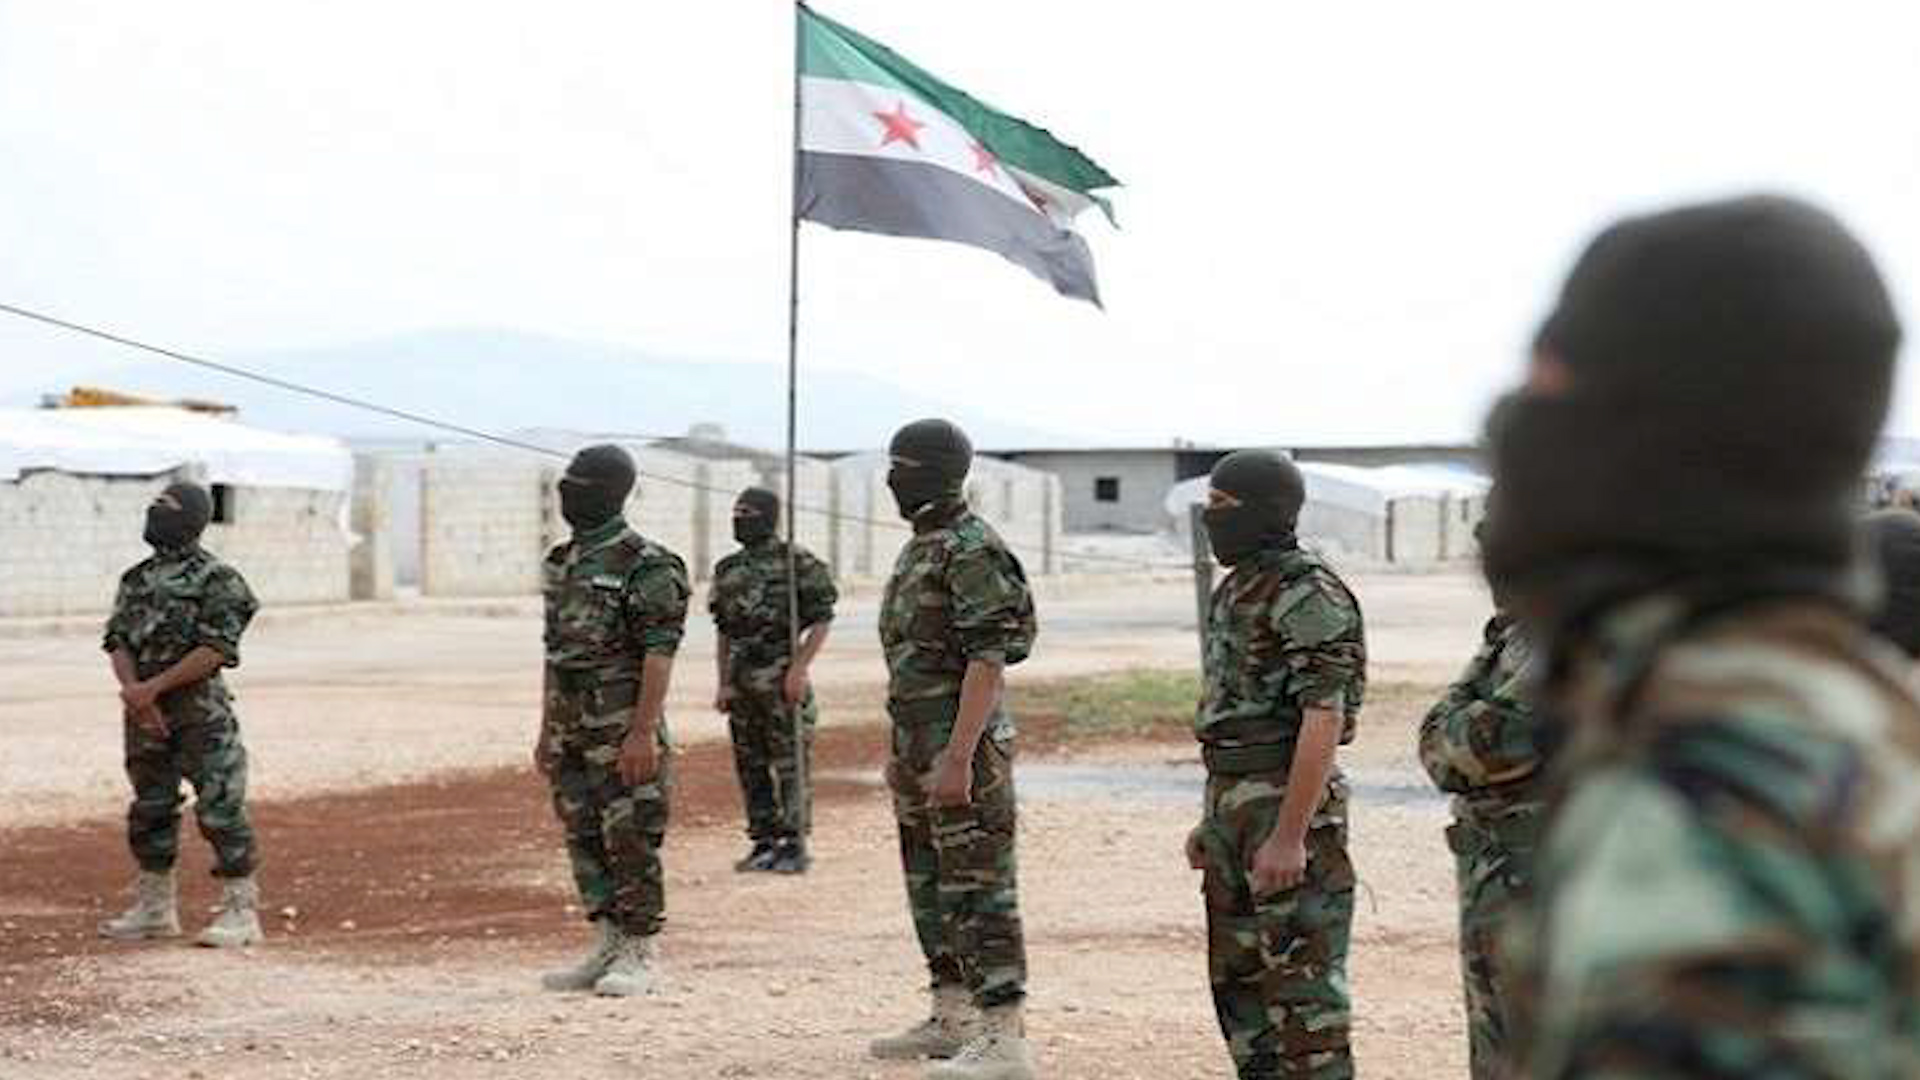 Photo of افتتاح مكاتب في عفرين لنقل المرتزقة للقتال في ليبيا مقابل 1800 – 2000 دولار شهرياً